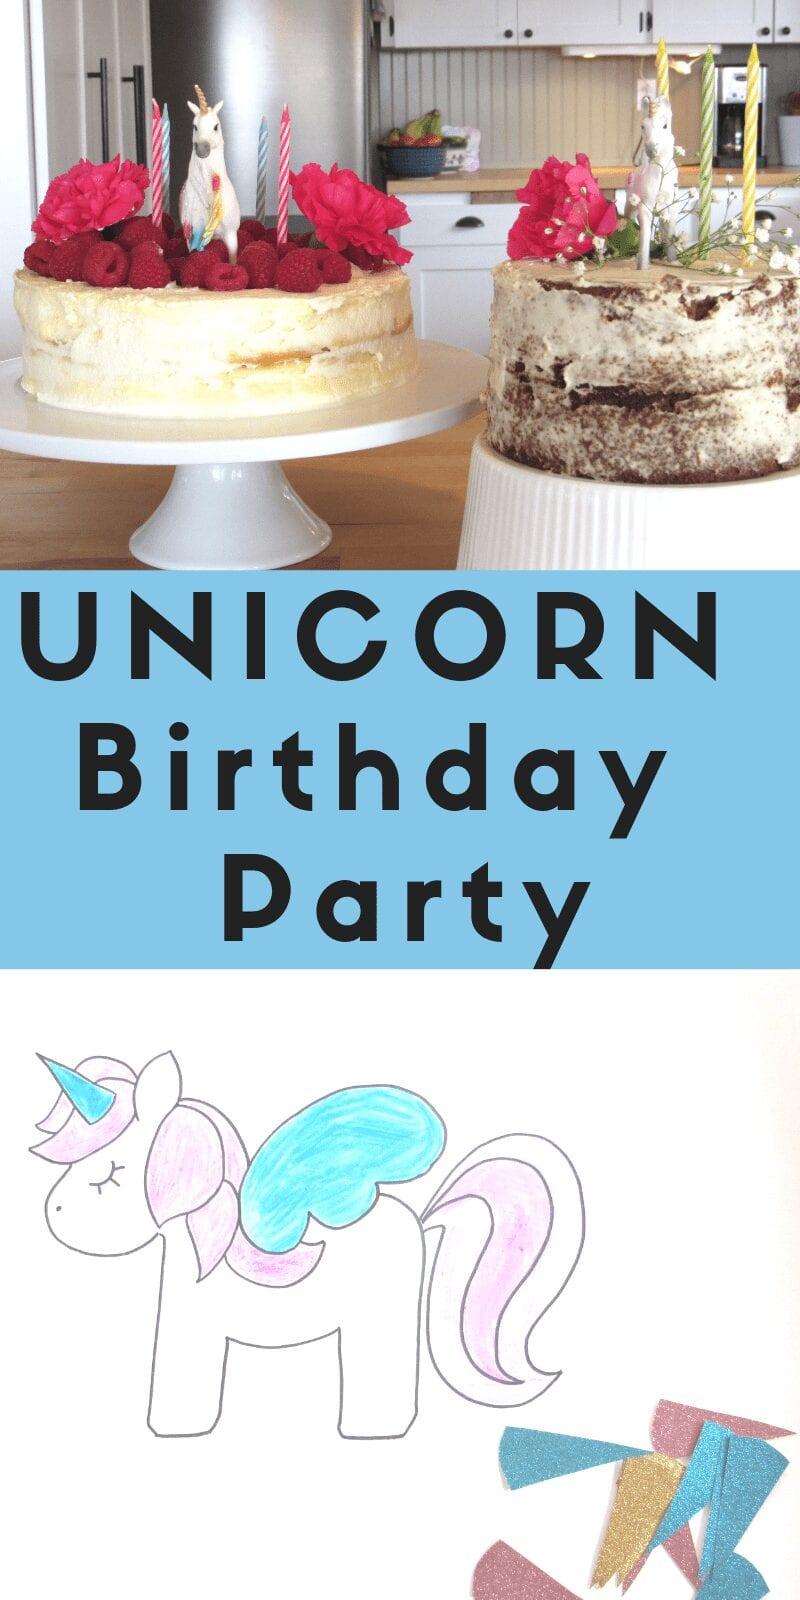 unicorn birthday party | unicorn cake, unicorn crafts